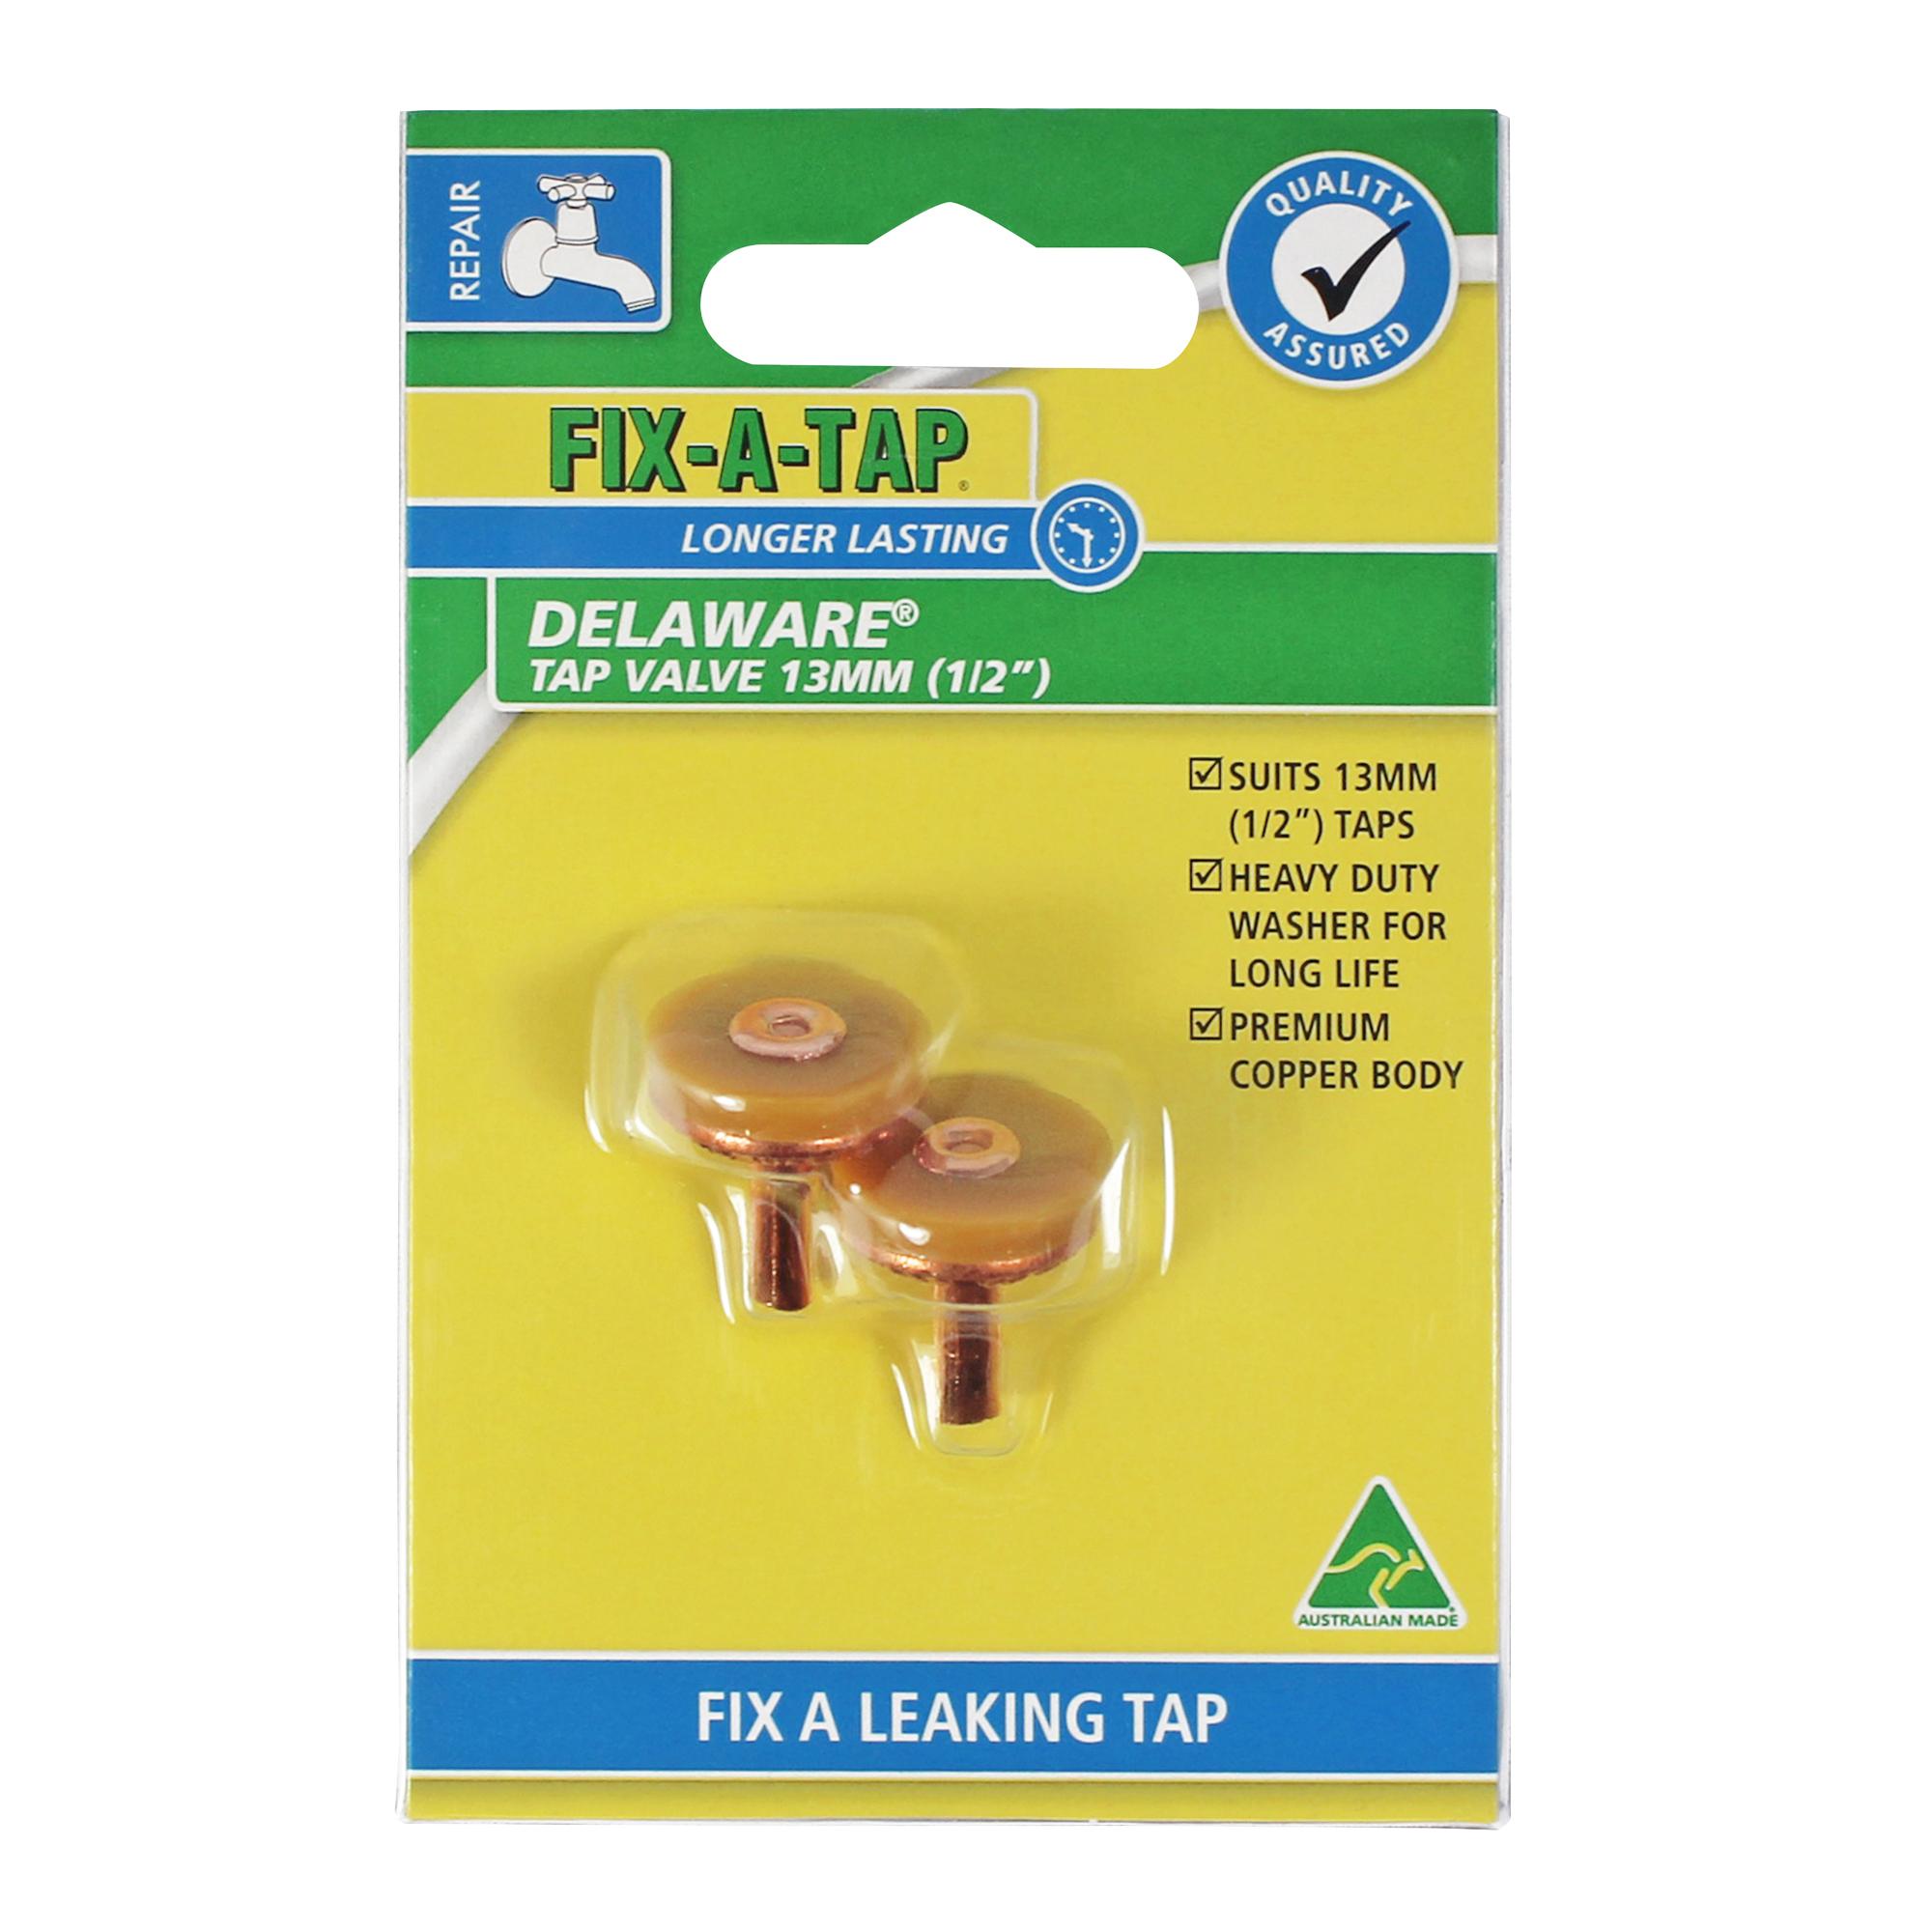 Delaware Tap Valves - Tap Valves - FIX-A-TAP